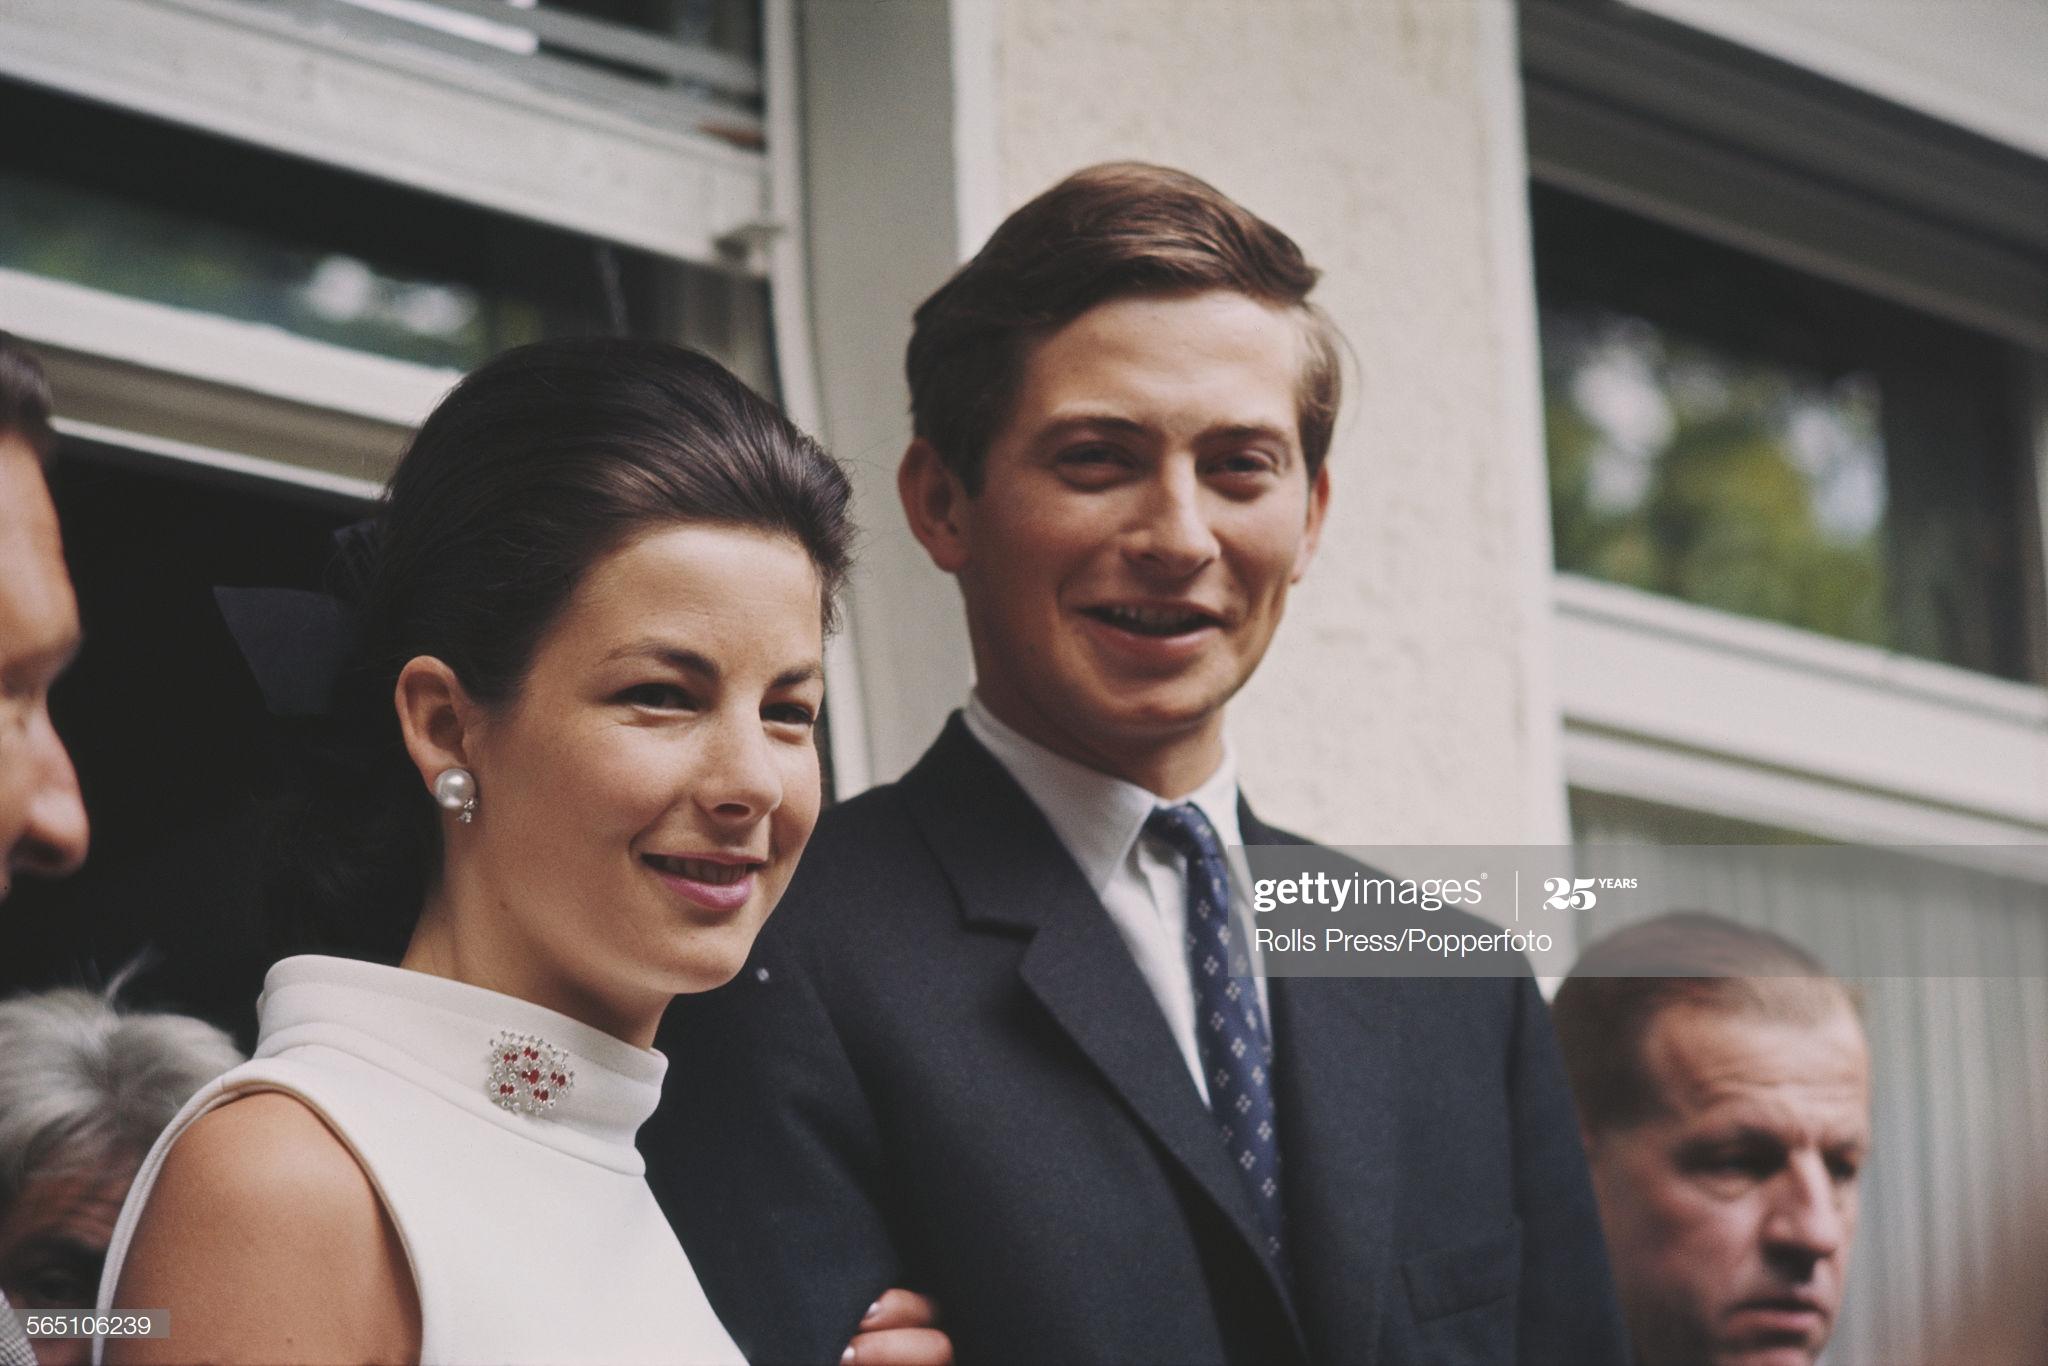 Мария Аглая, принцесса Лихтенштейна - 80лет!!!: ru_royalty — LiveJournal